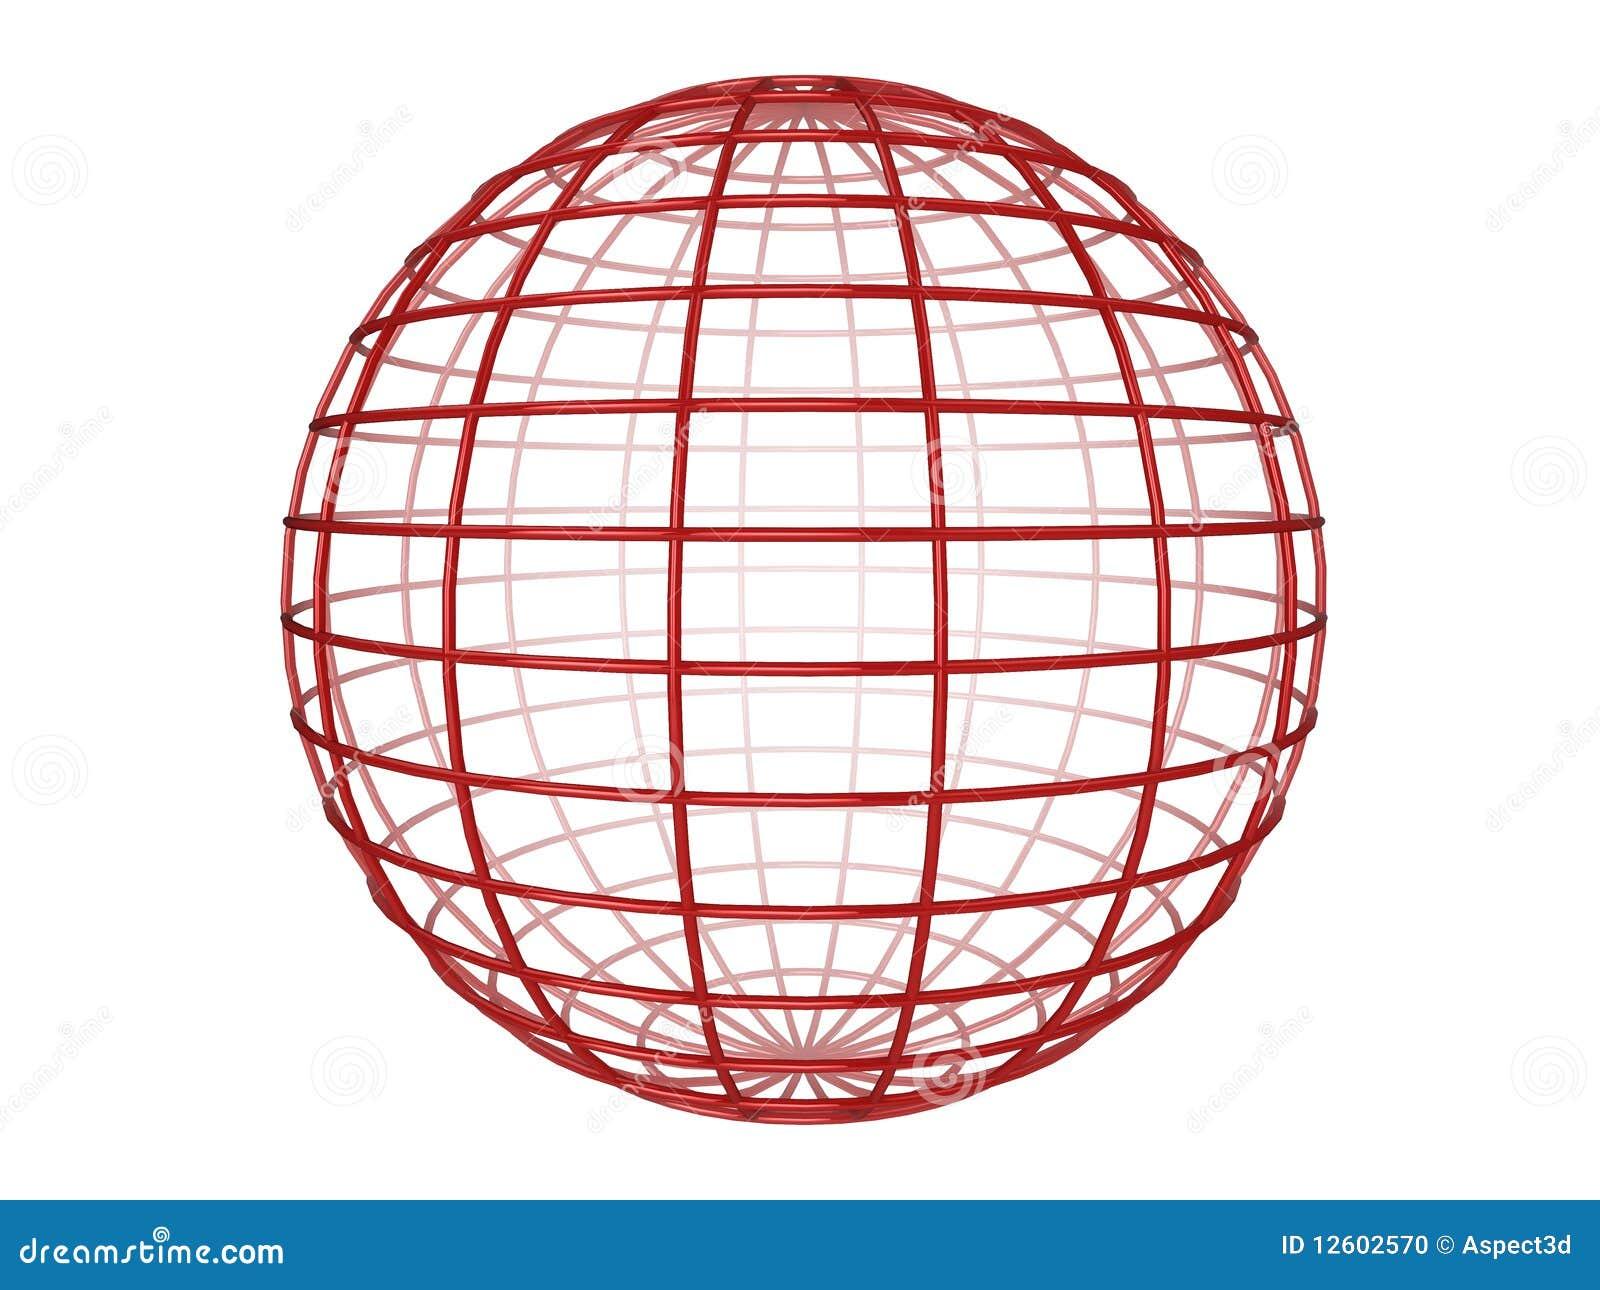 Wireframe Sphere Stock Photo